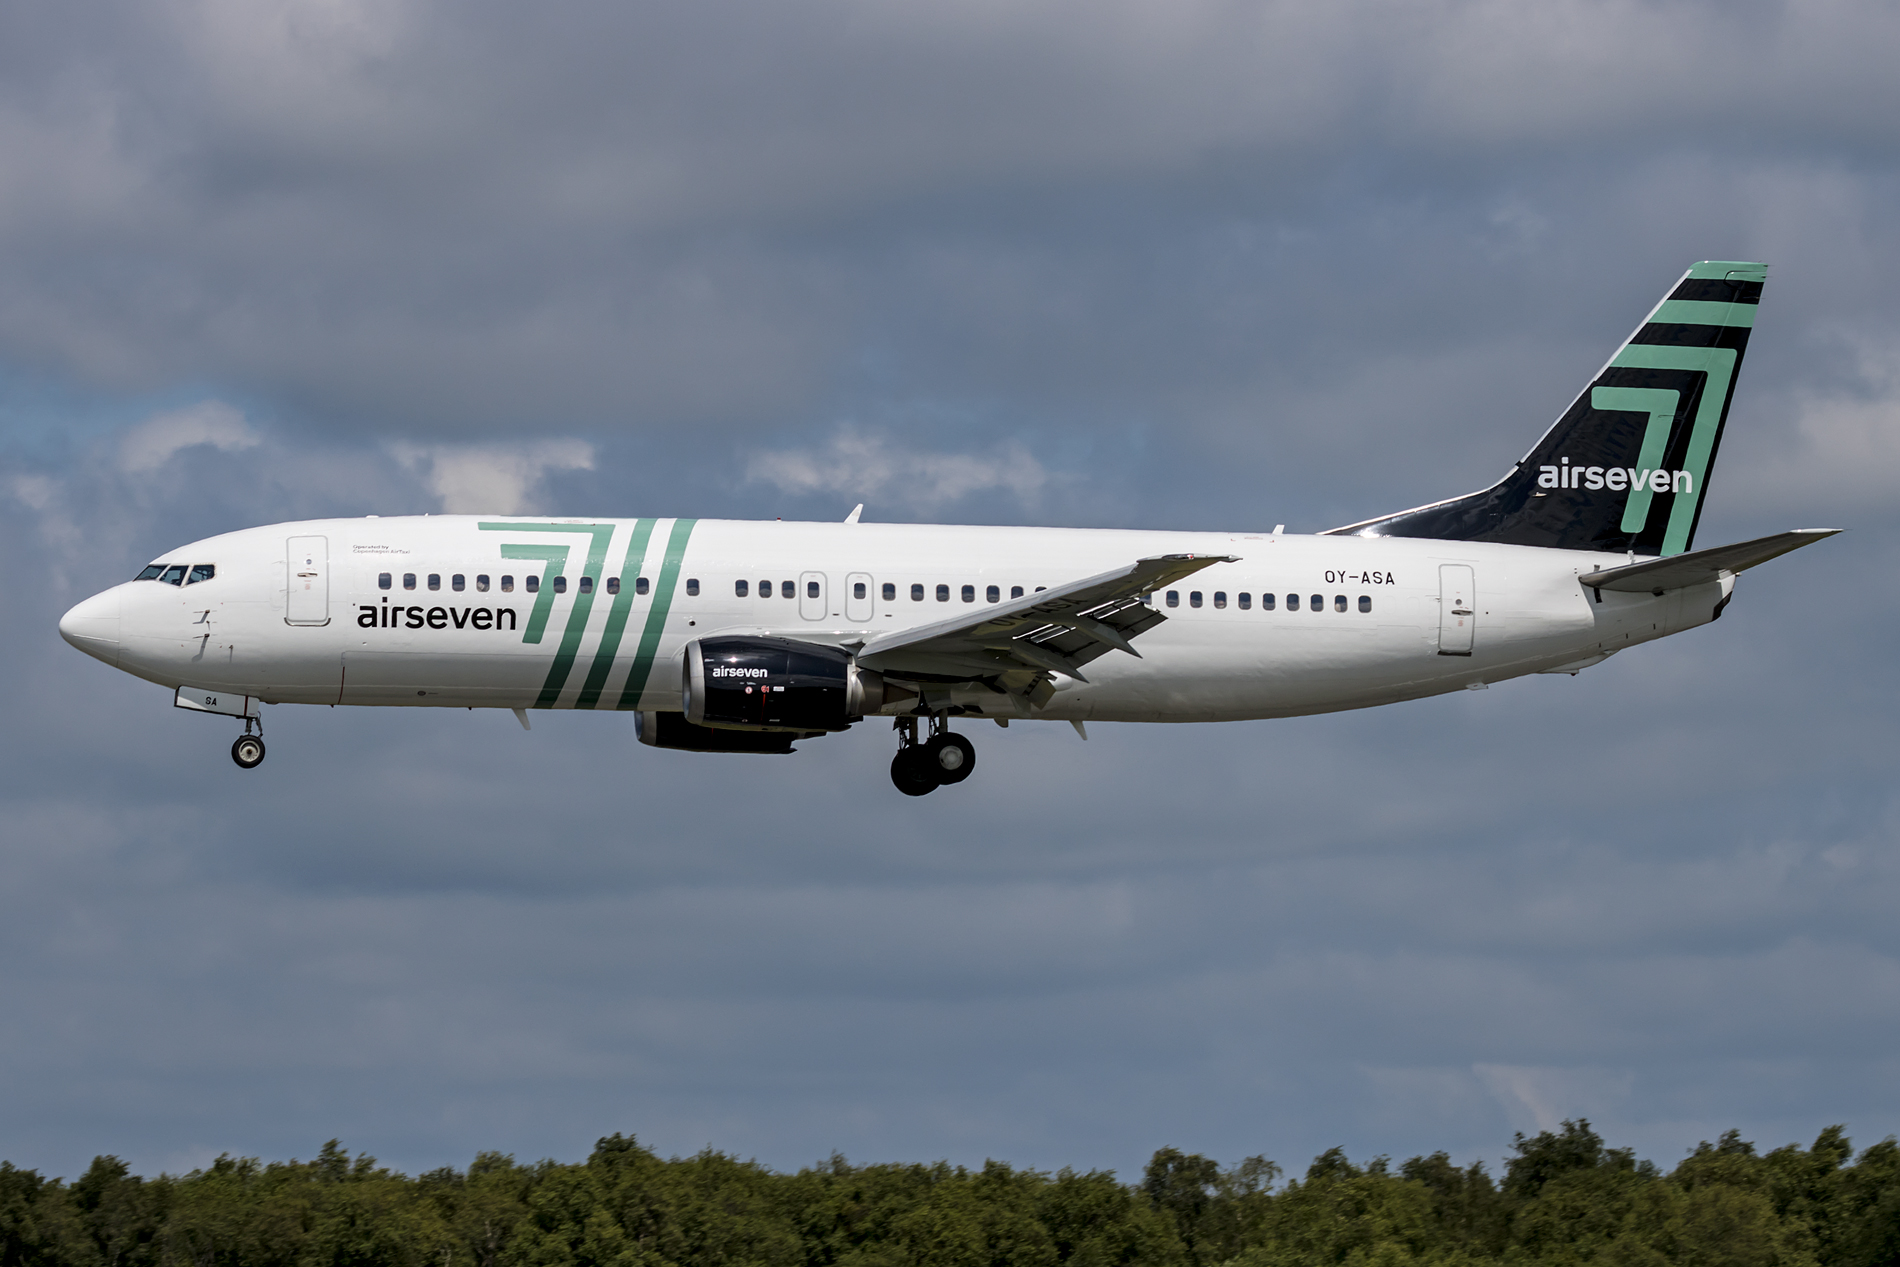 Boeing 737-400 (OY-ASA) fra Airseven. (Foto: Dirk Grothe)